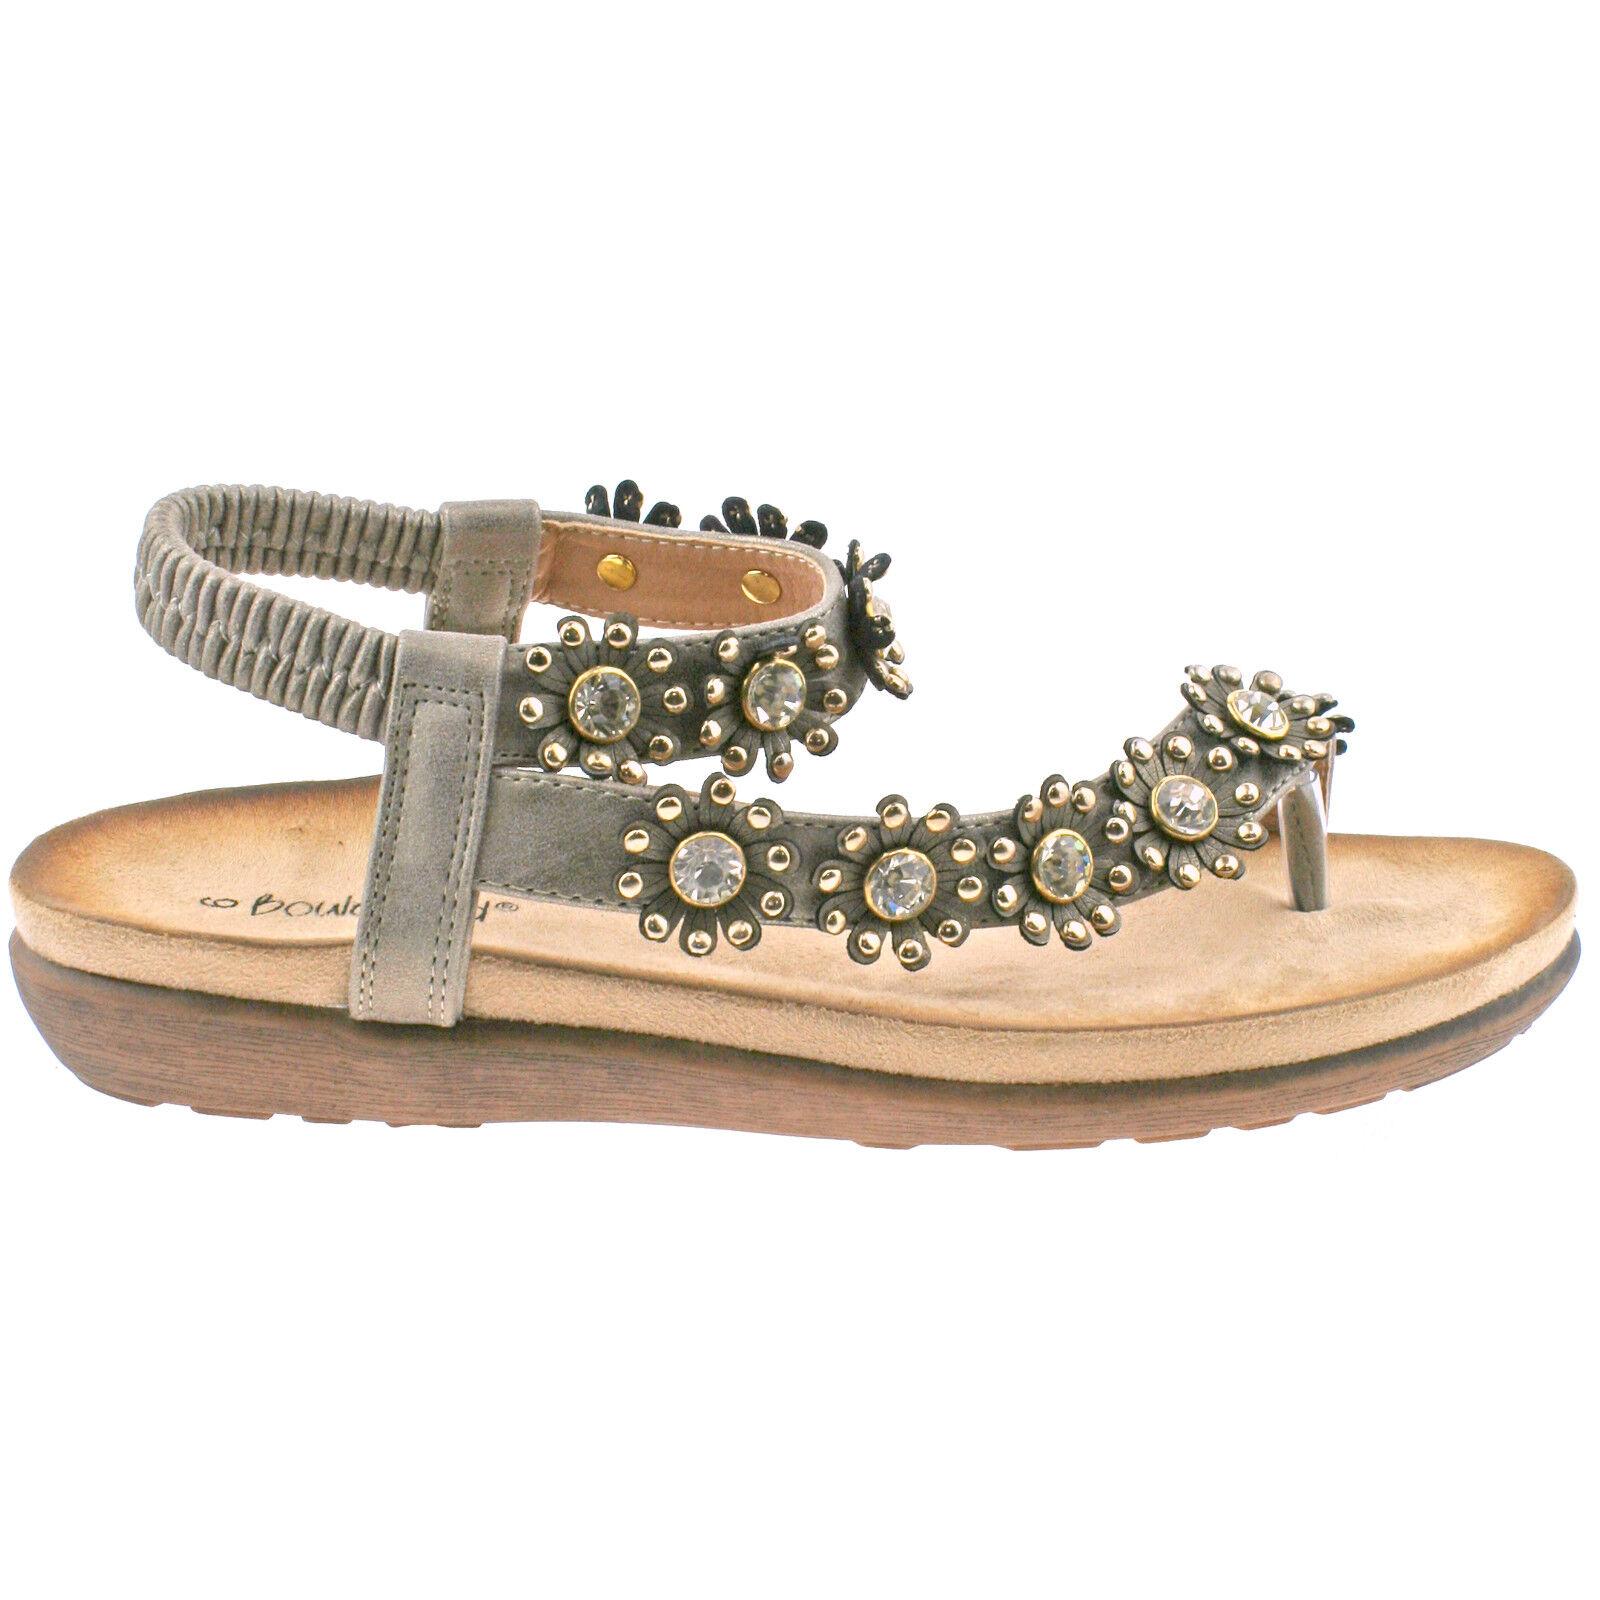 f7e2da96521b Boulevard Snake Pattern Toe Post Sling Back Summer Mule Sandals ...